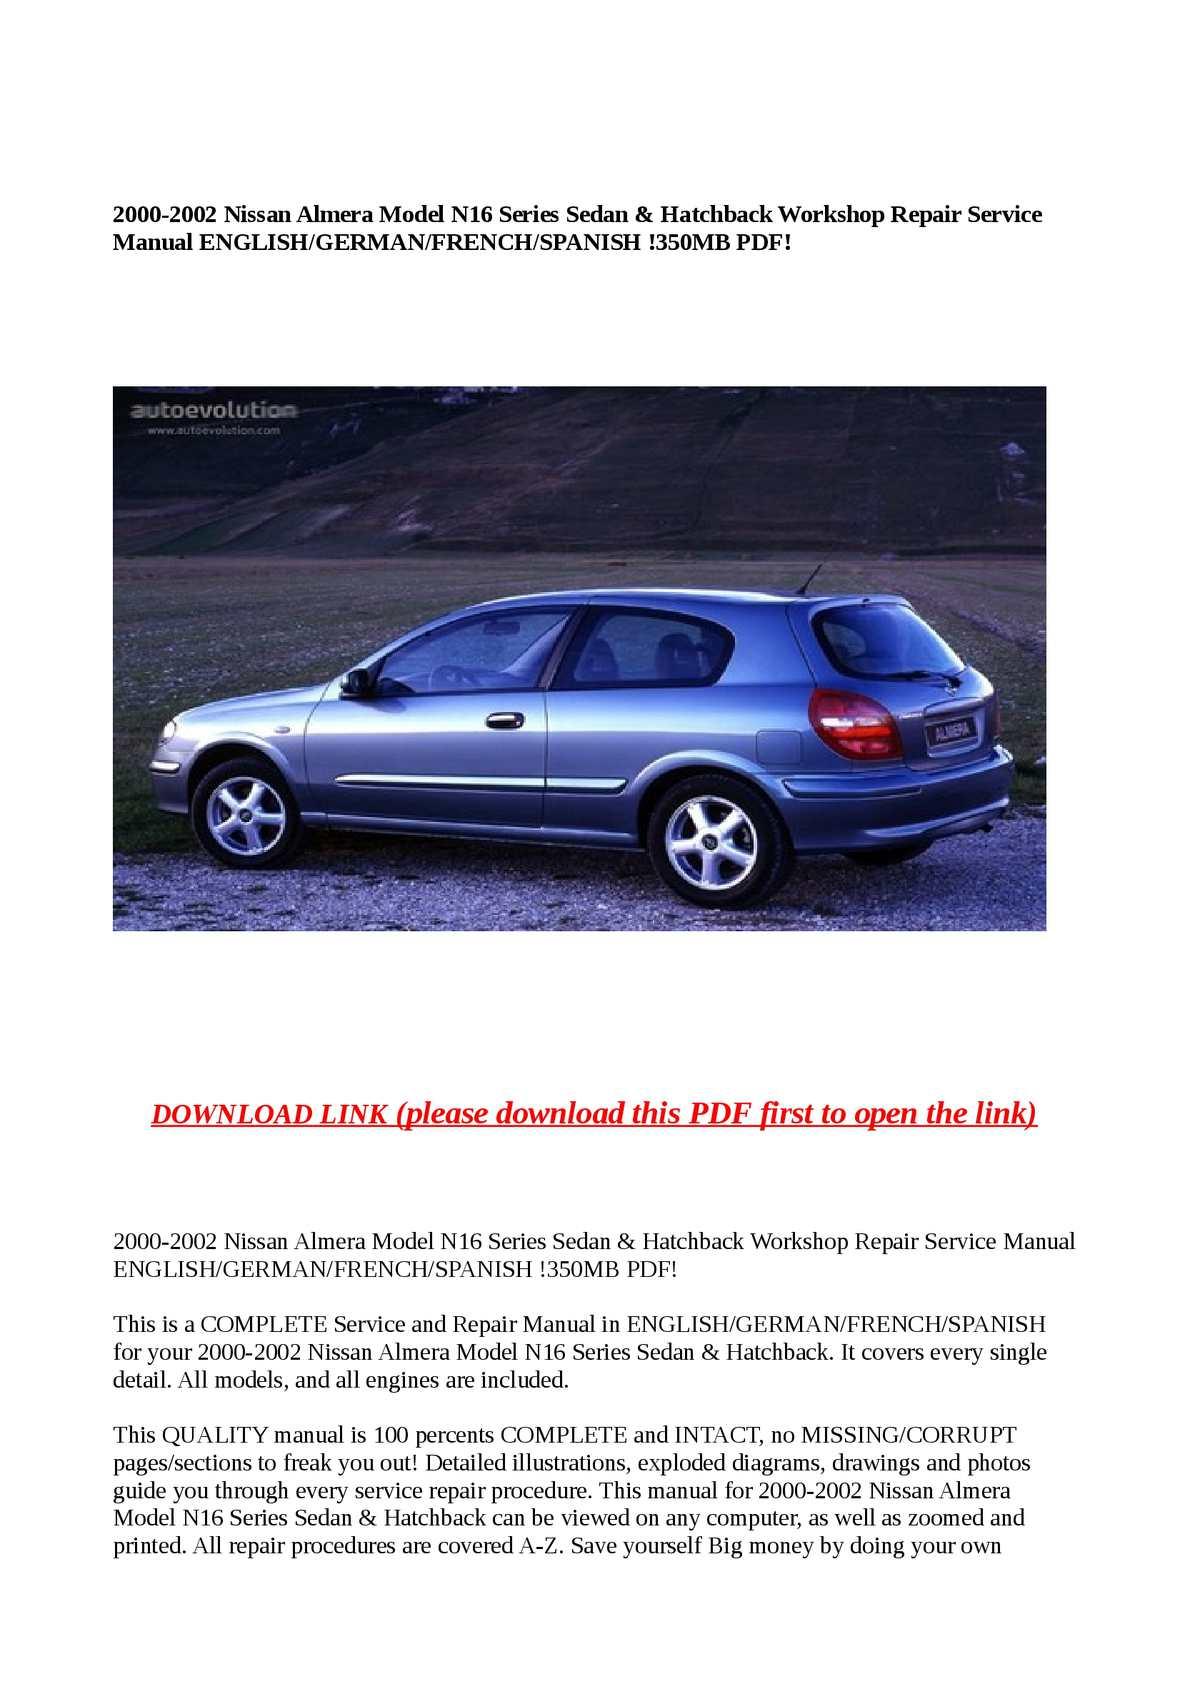 Calaméo - 2000-2002 Nissan Almera Model N16 Series Sedan & Hatchback Workshop  Repair Service Manual ENGLISH/GERMAN/FRENCH/SPANISH !350MB PDF!